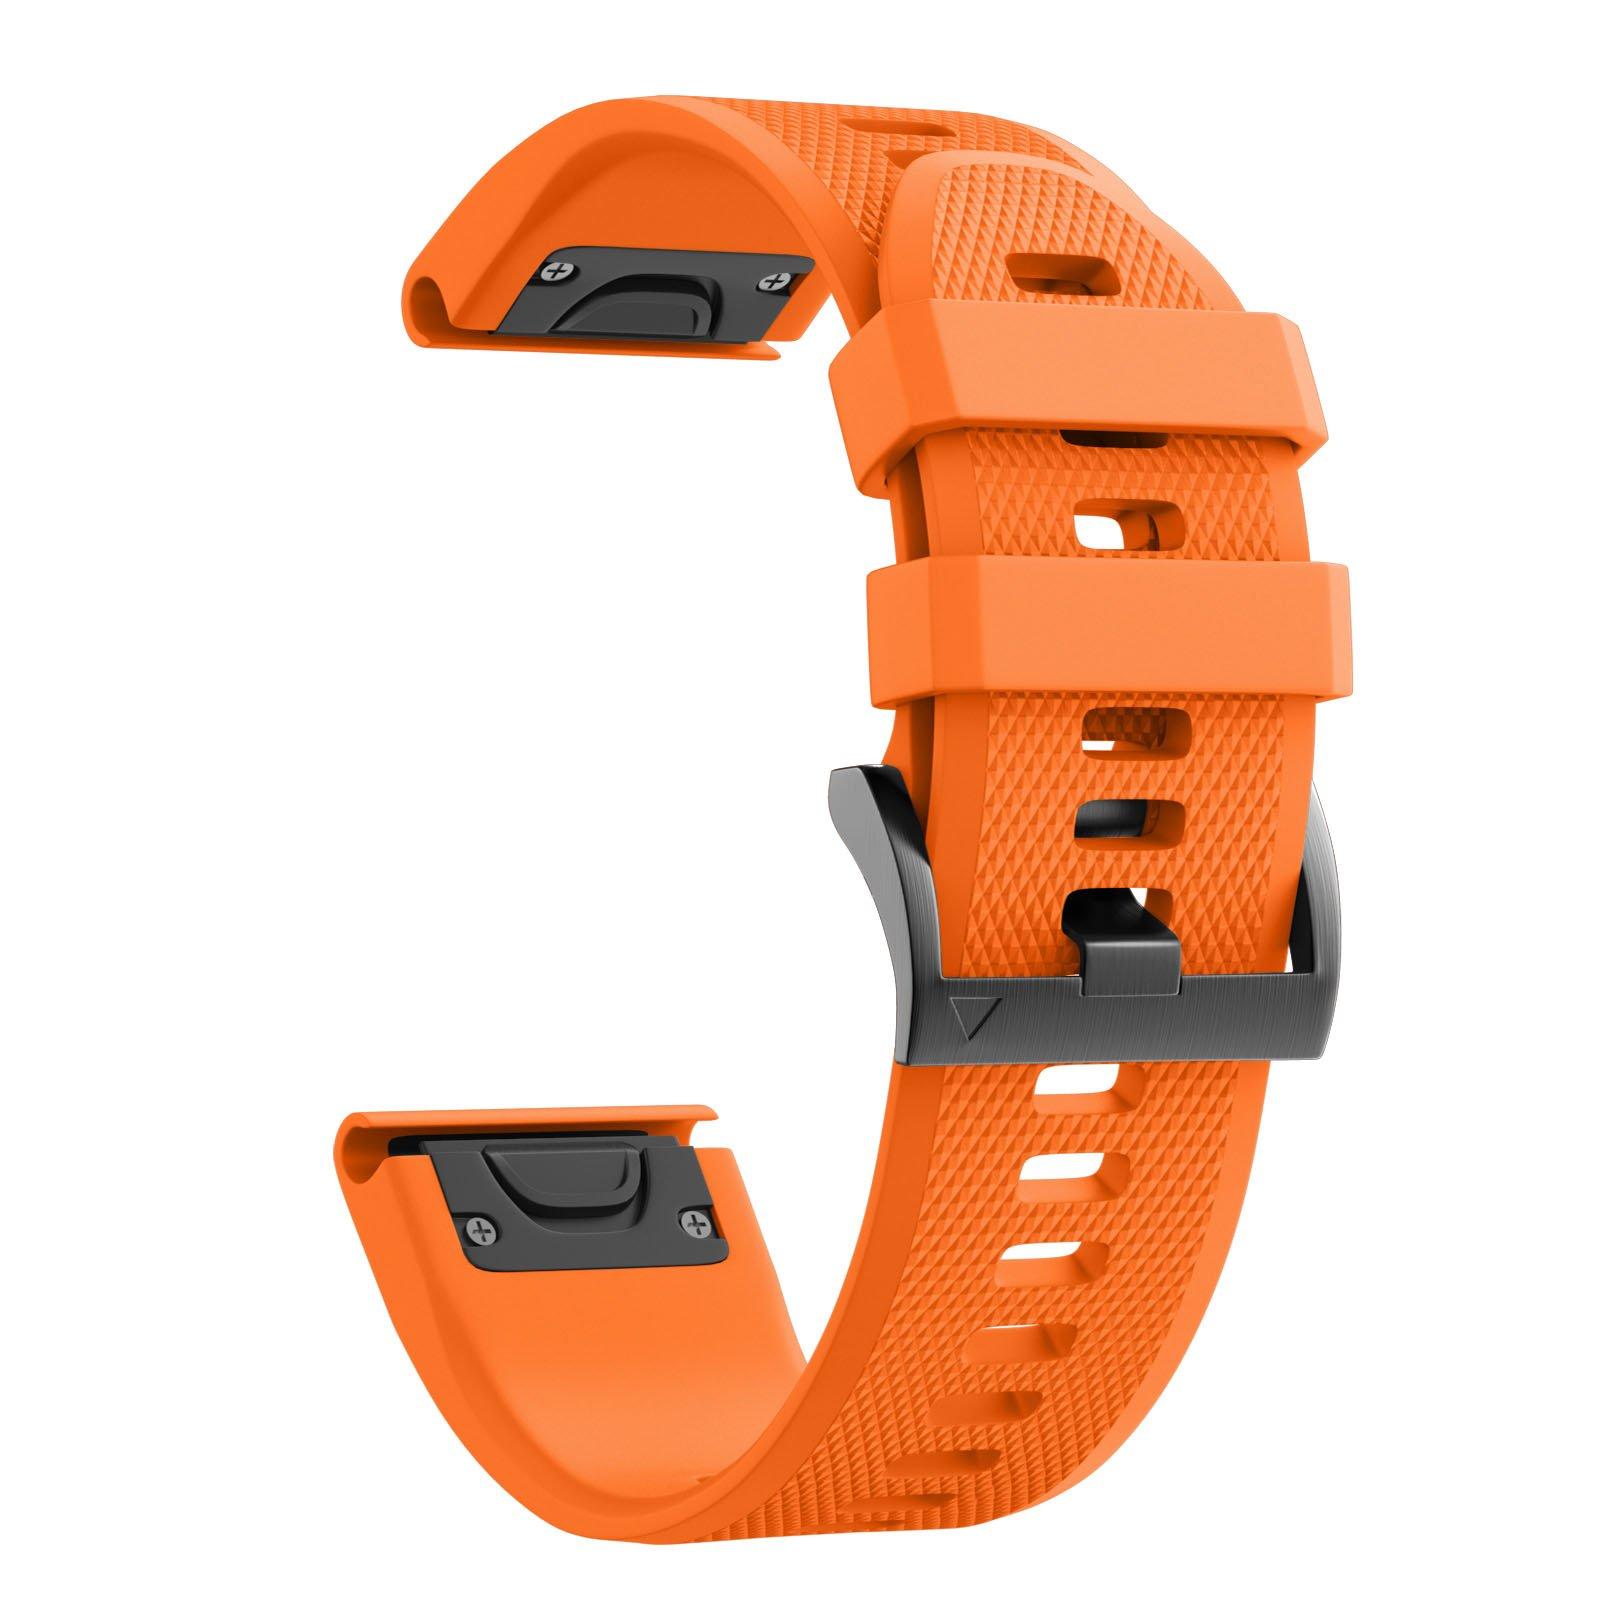 ANCOOL Compatible Garmin Fenix 5 Band Easy Fit 22mm Width Soft Silicone Watch Strap Compatible Garmin Fenix 5/Fenix 5 Plus/Forerunner 935/Approach S60/Quatix 5 - Orange